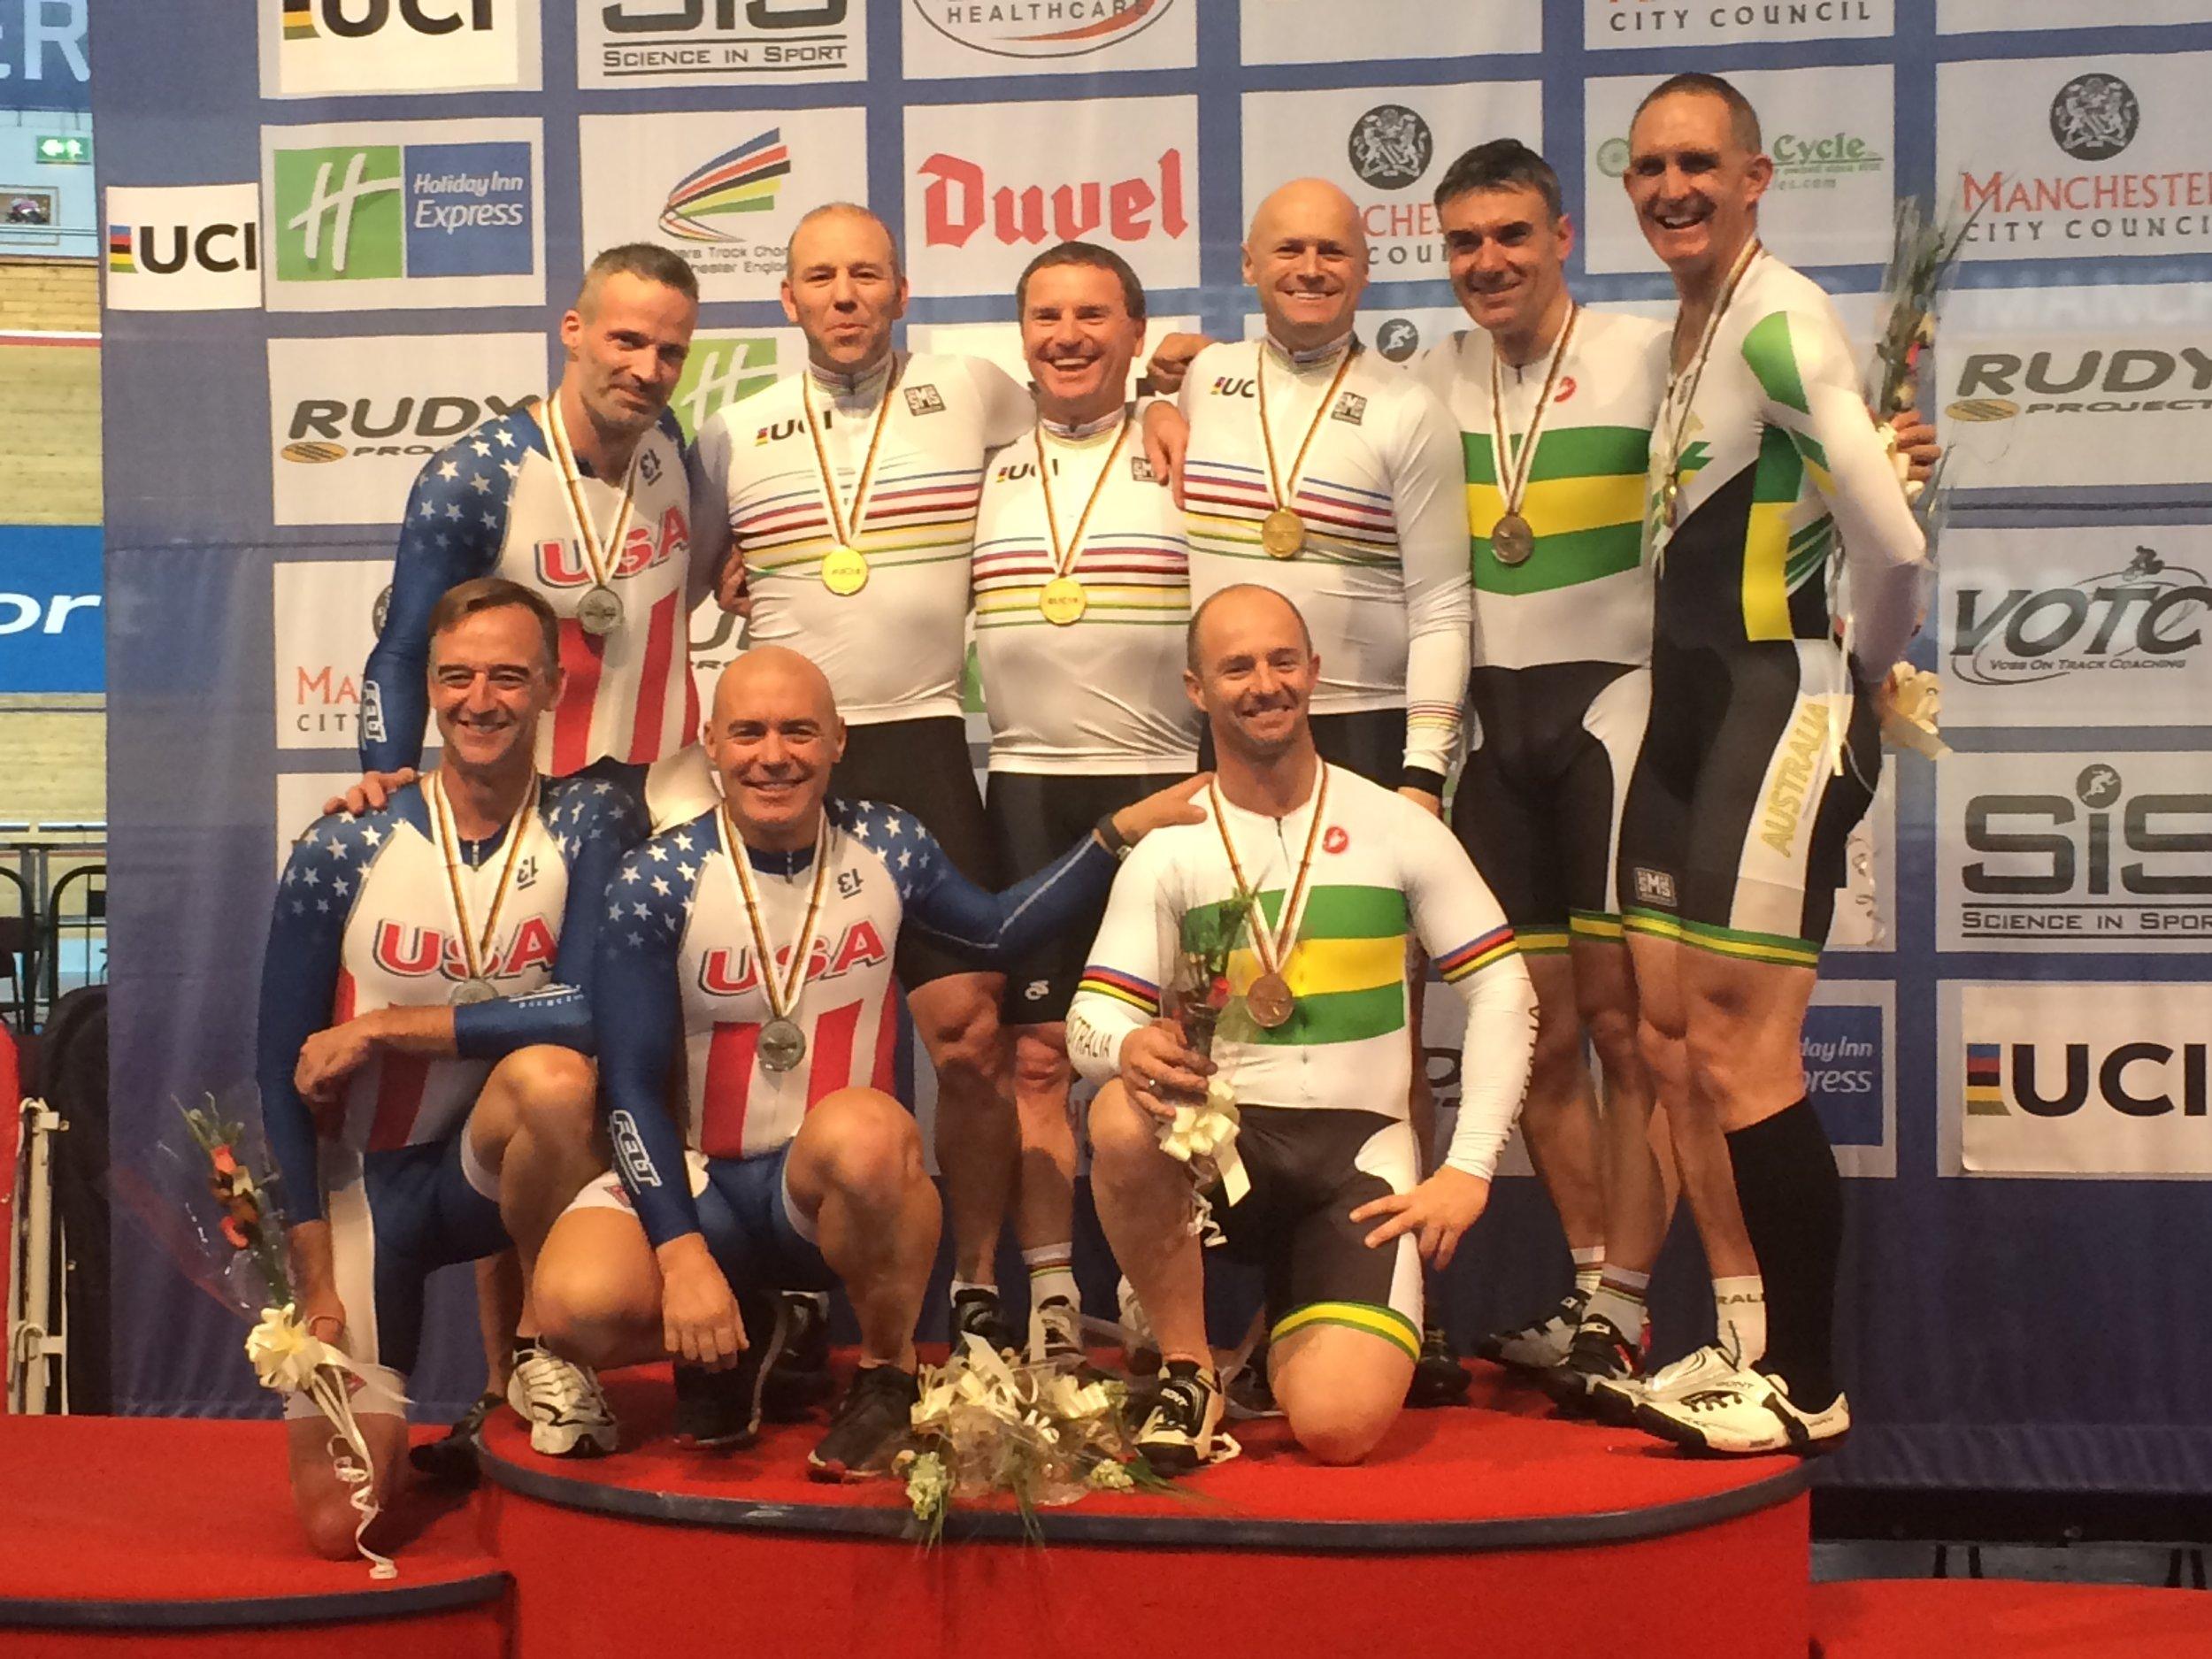 Manchester - Team Sprint podium for the Bronze